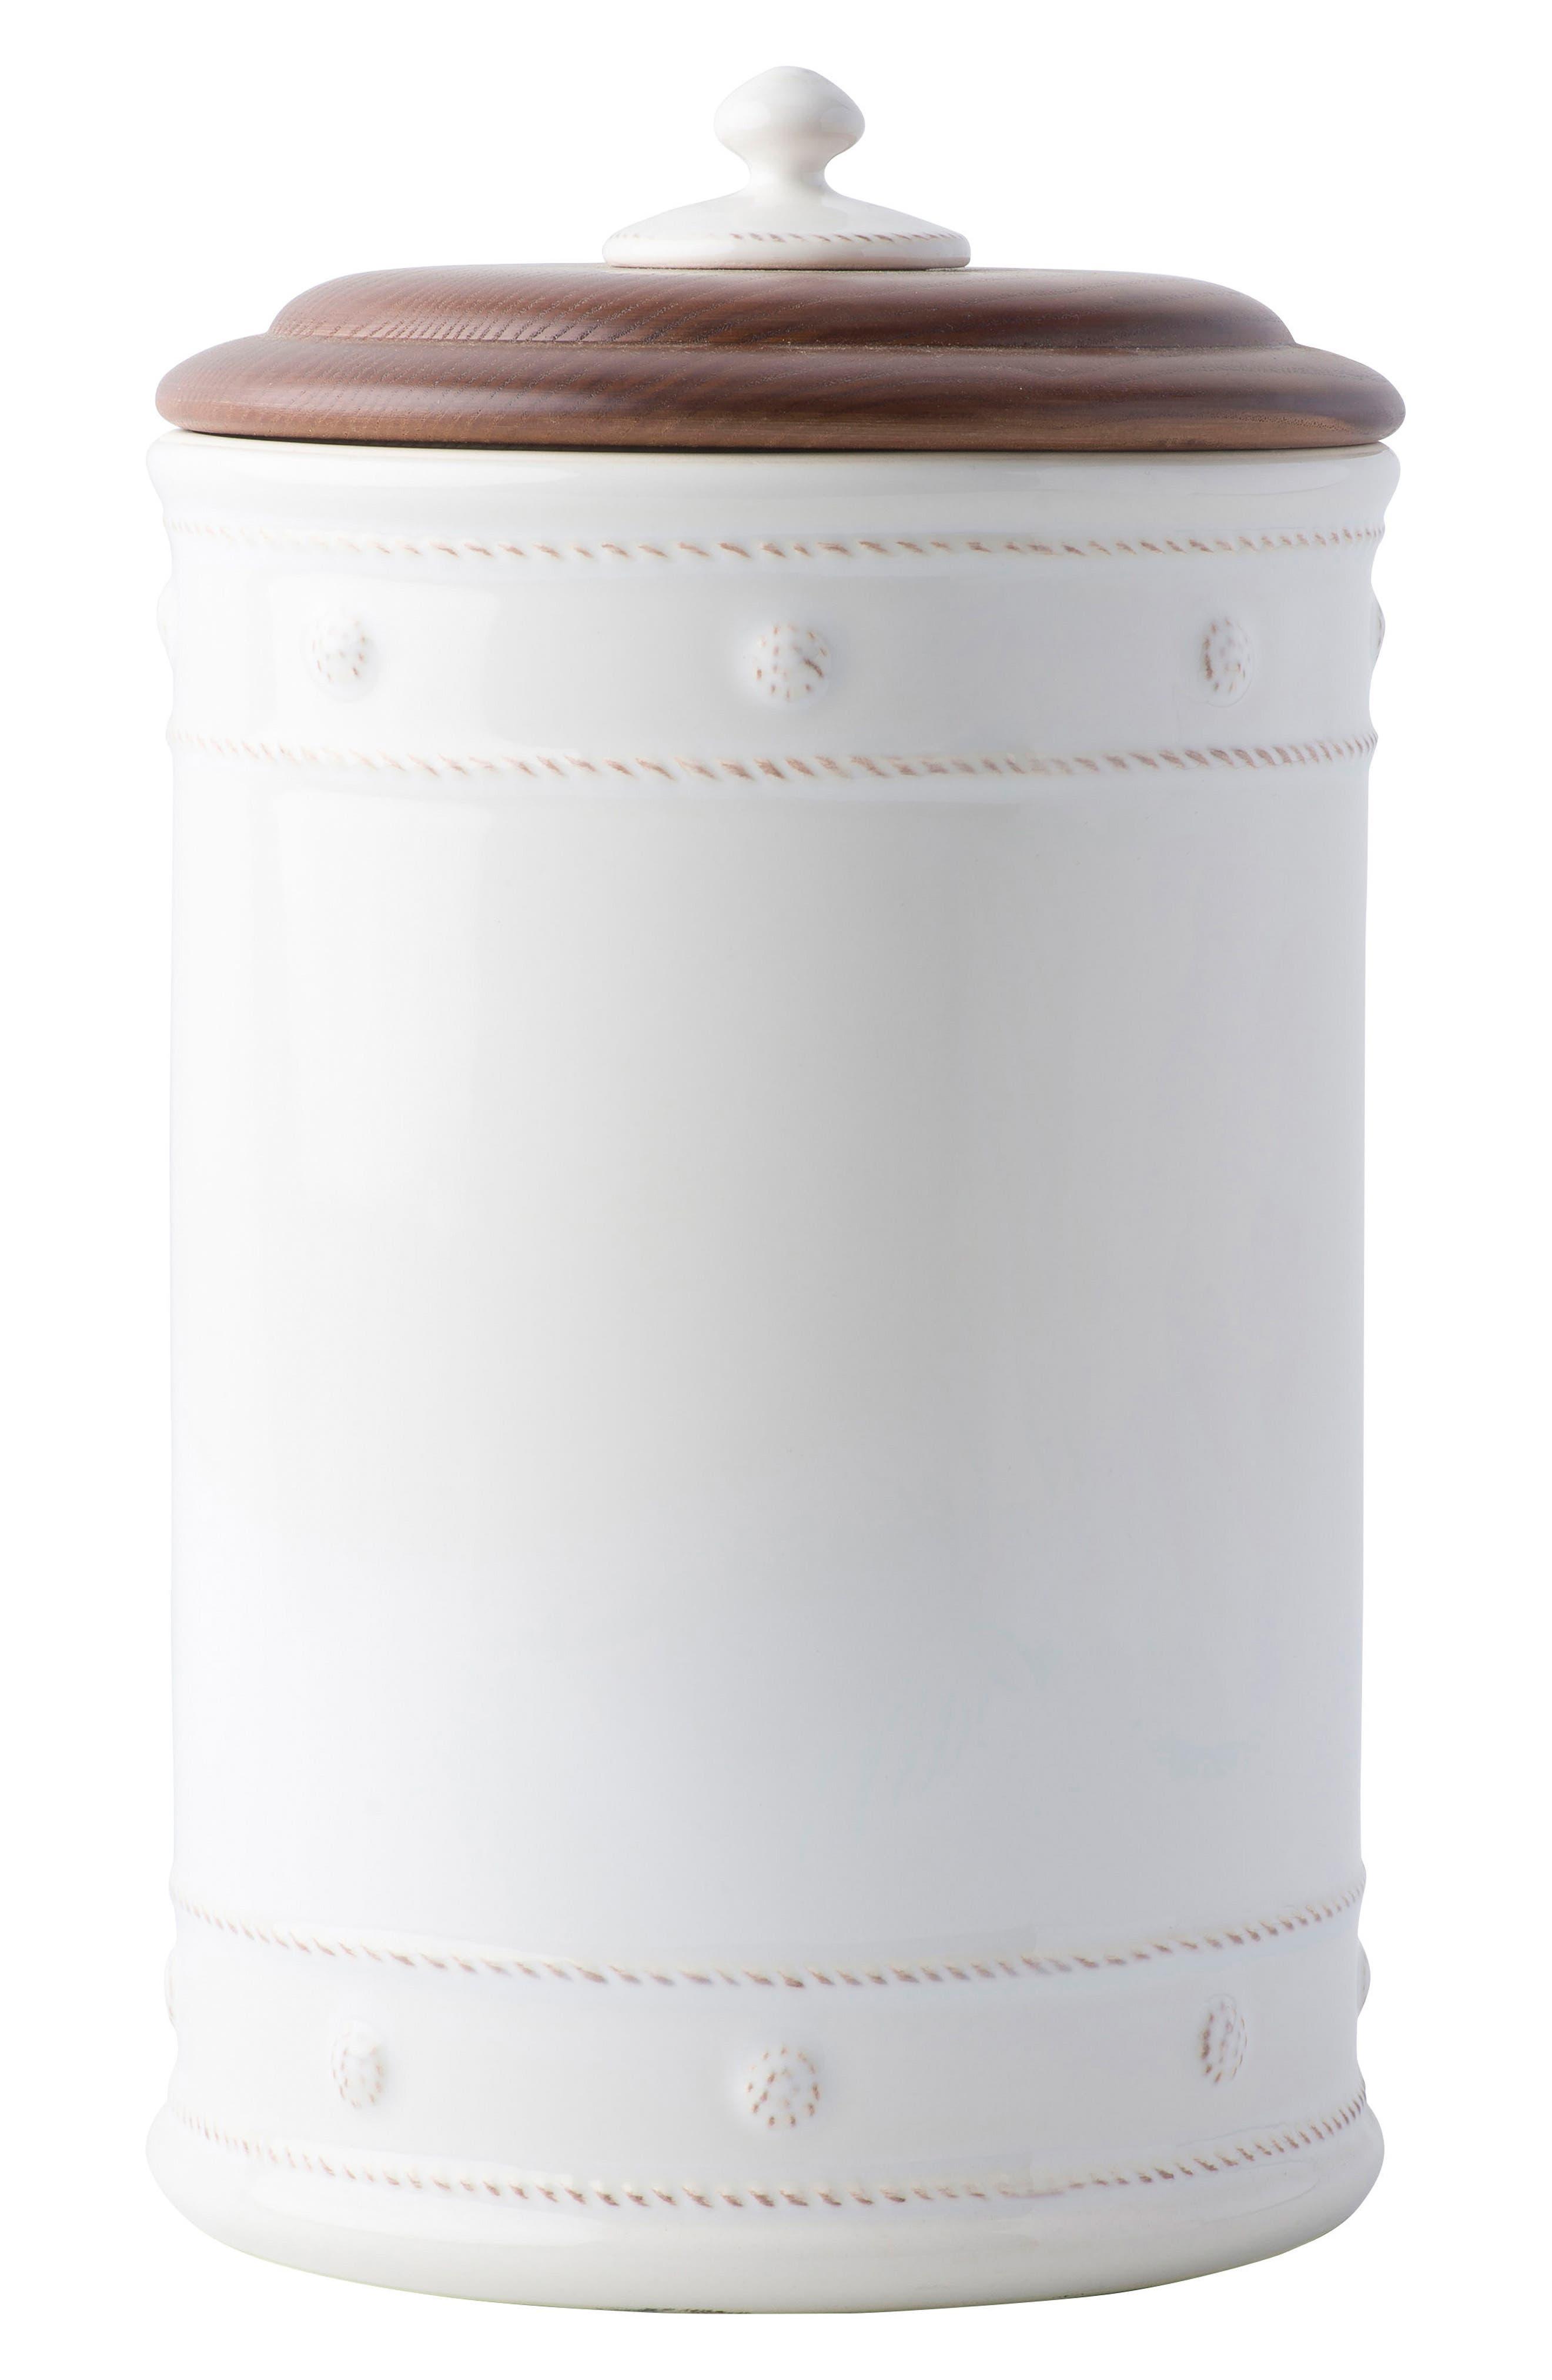 Berry & Thread Whitewash Ceramic Canister,                         Main,                         color, Whitewash